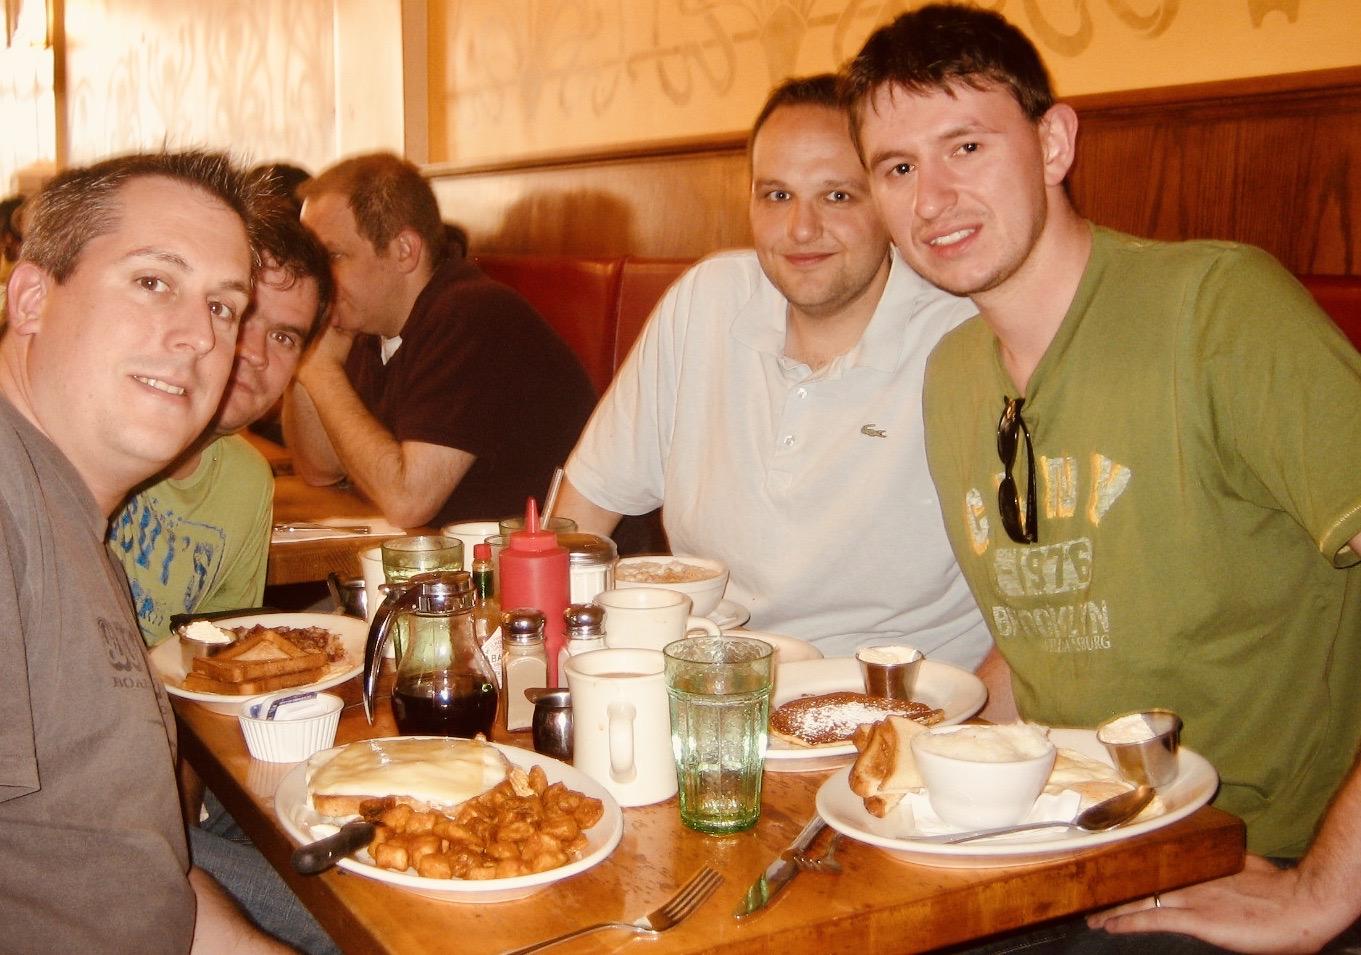 Breakfast at The Diner in Adams Morgan Washington DC